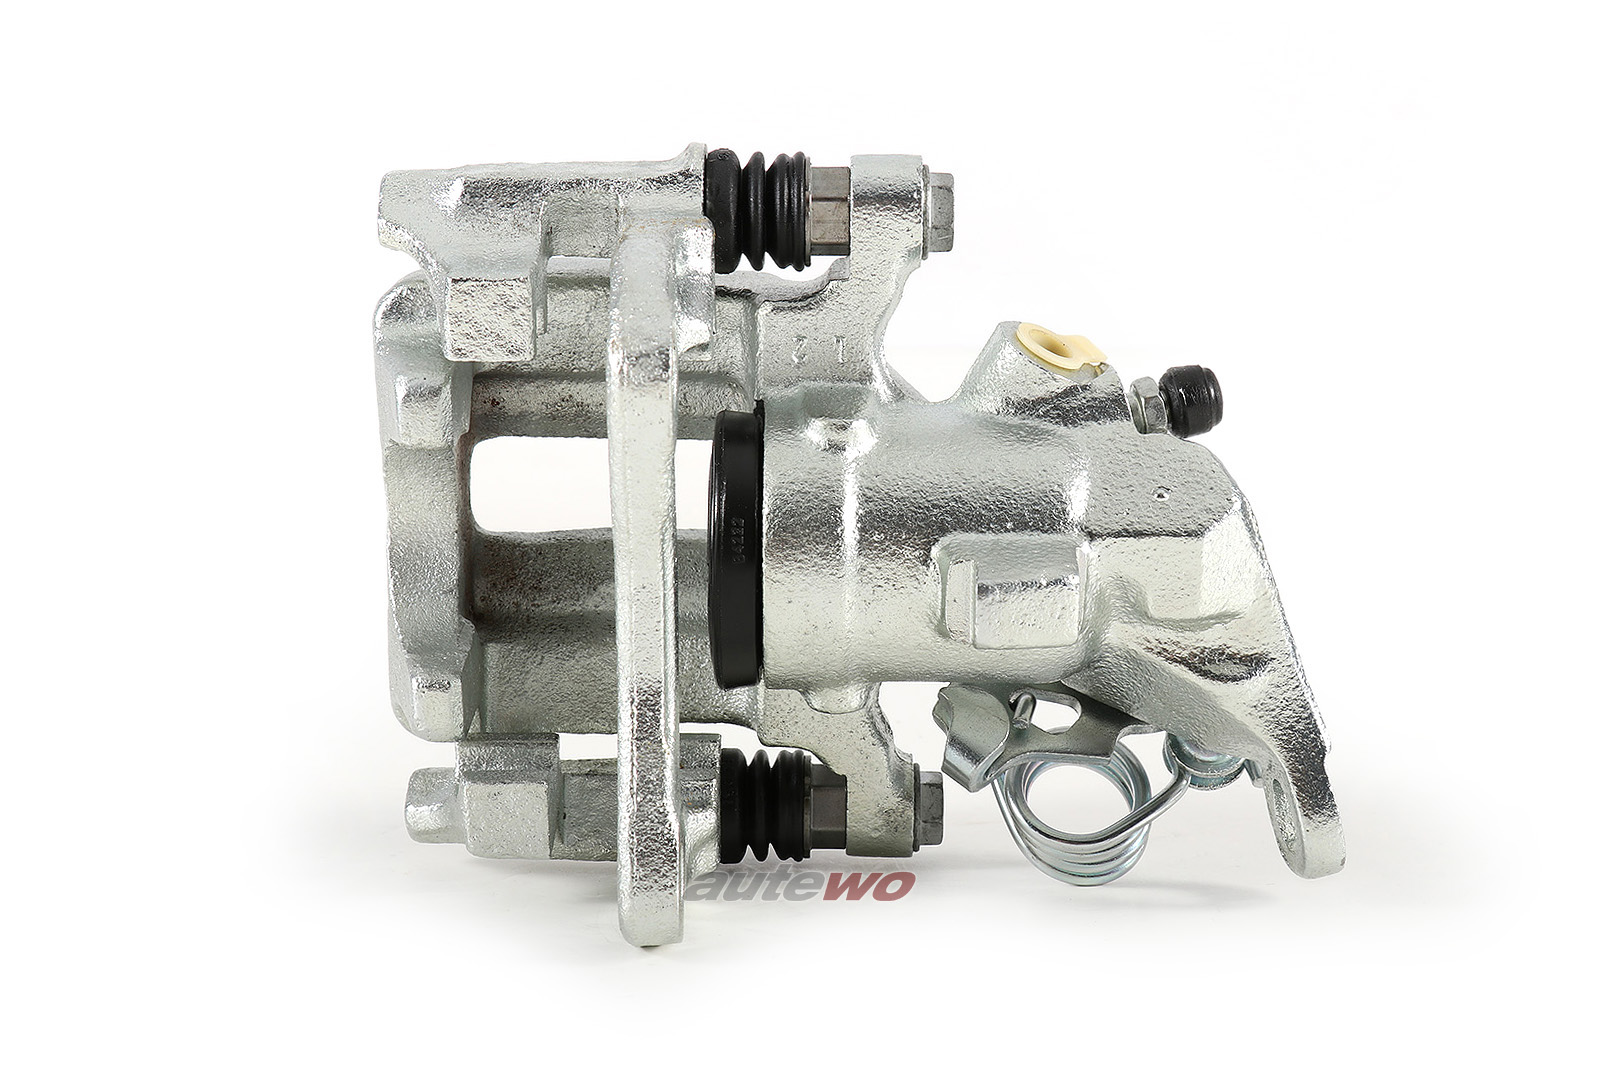 853615423AX Audi 80/90/Coupe 89/100/200 44/A6/A8 QUATTRO Bremssattel hinten